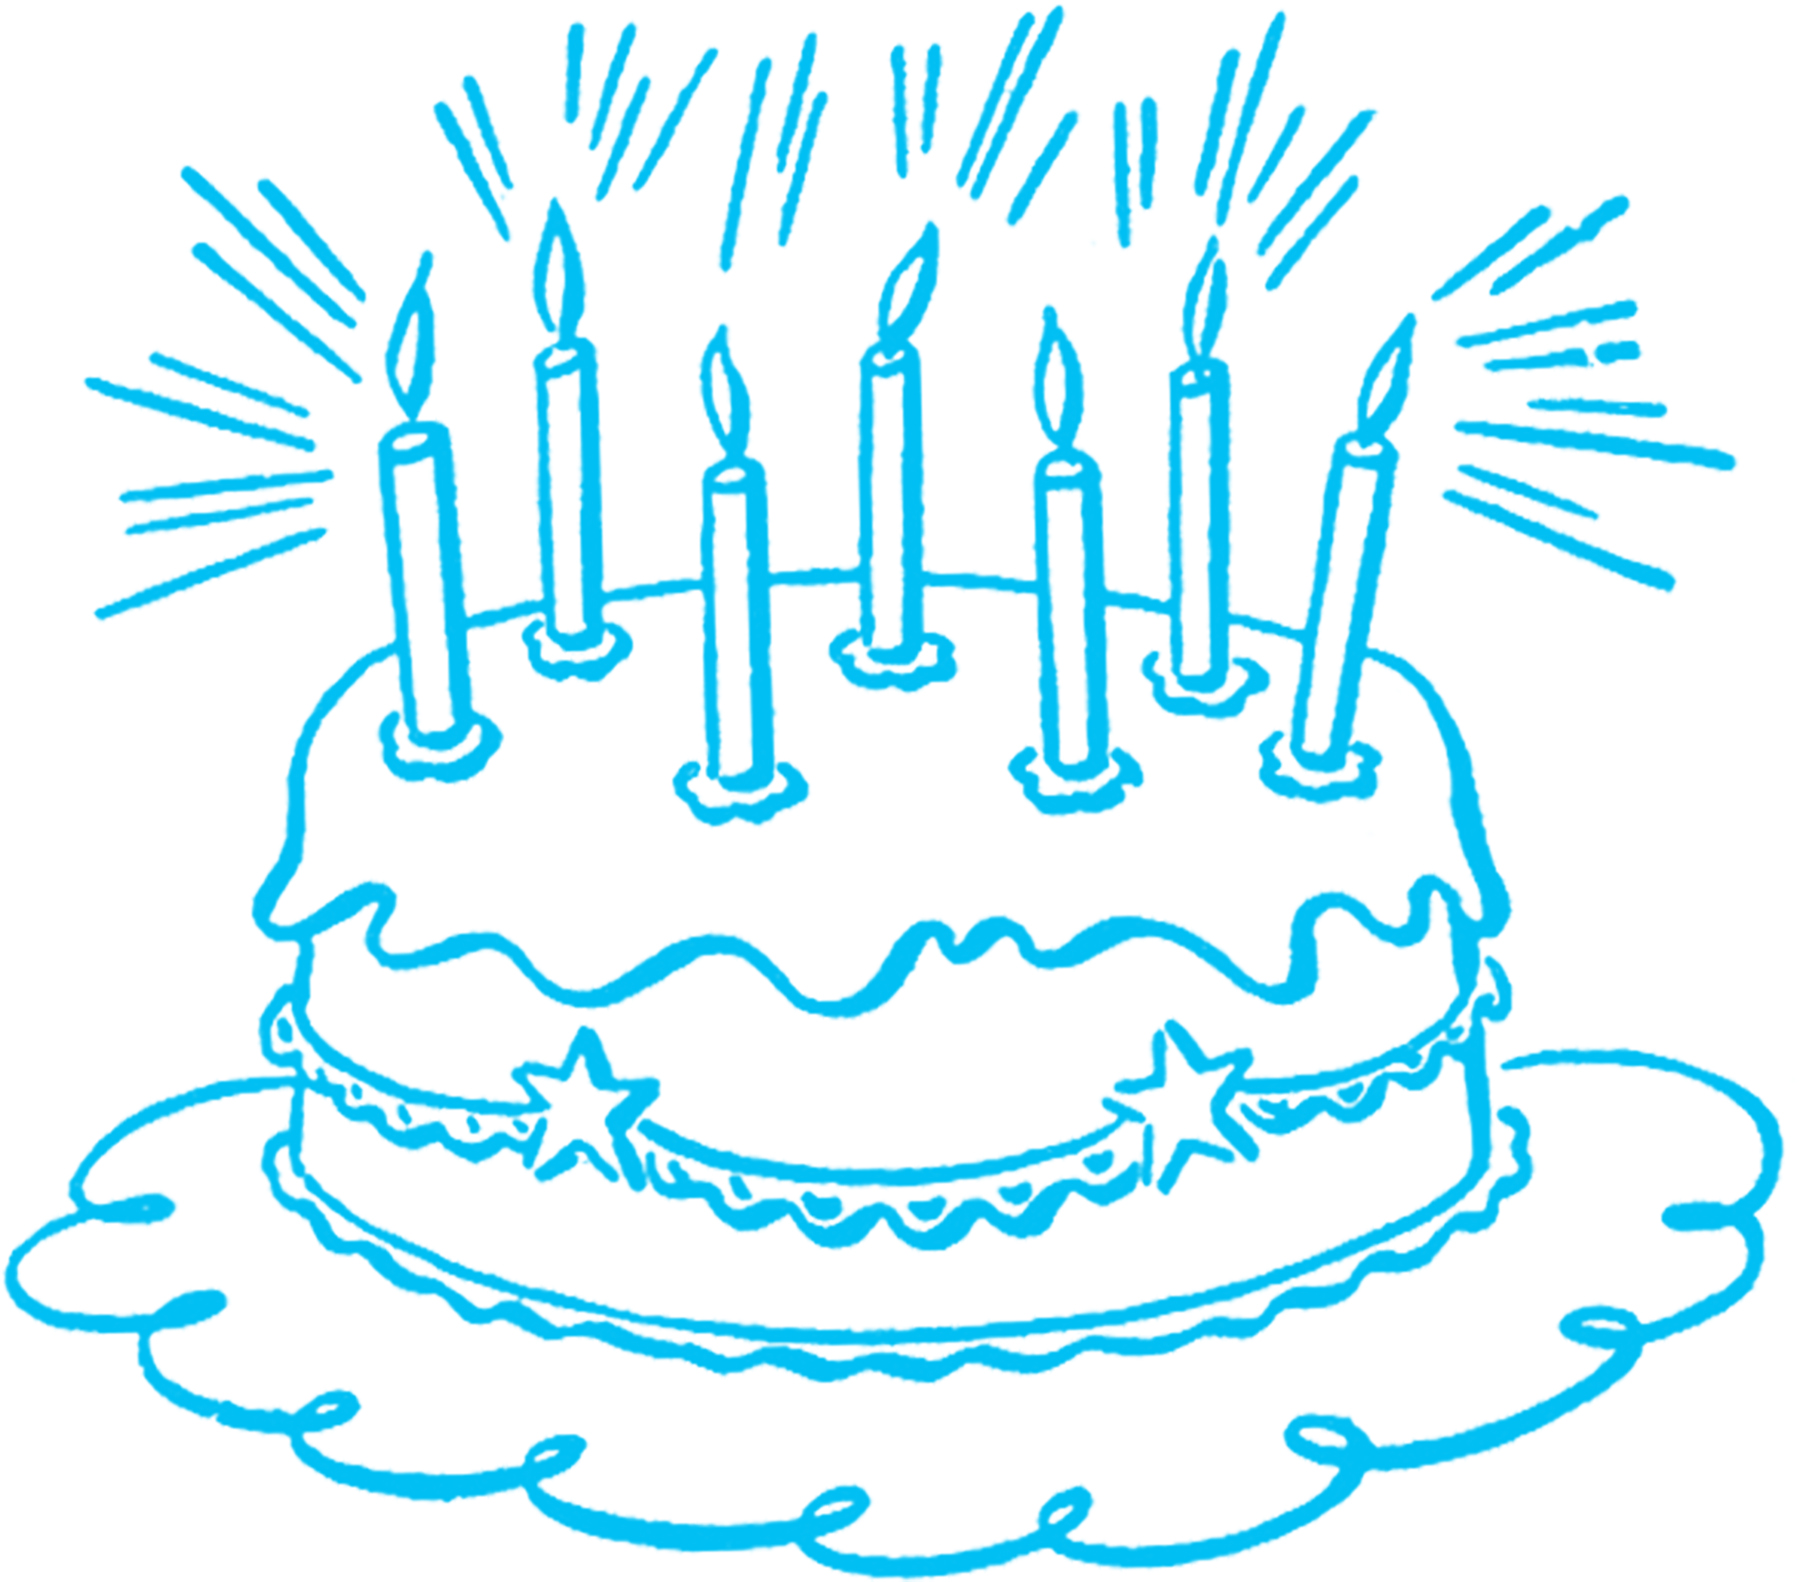 Vintage Birthday Cake Line Art - The Graphics Fairy